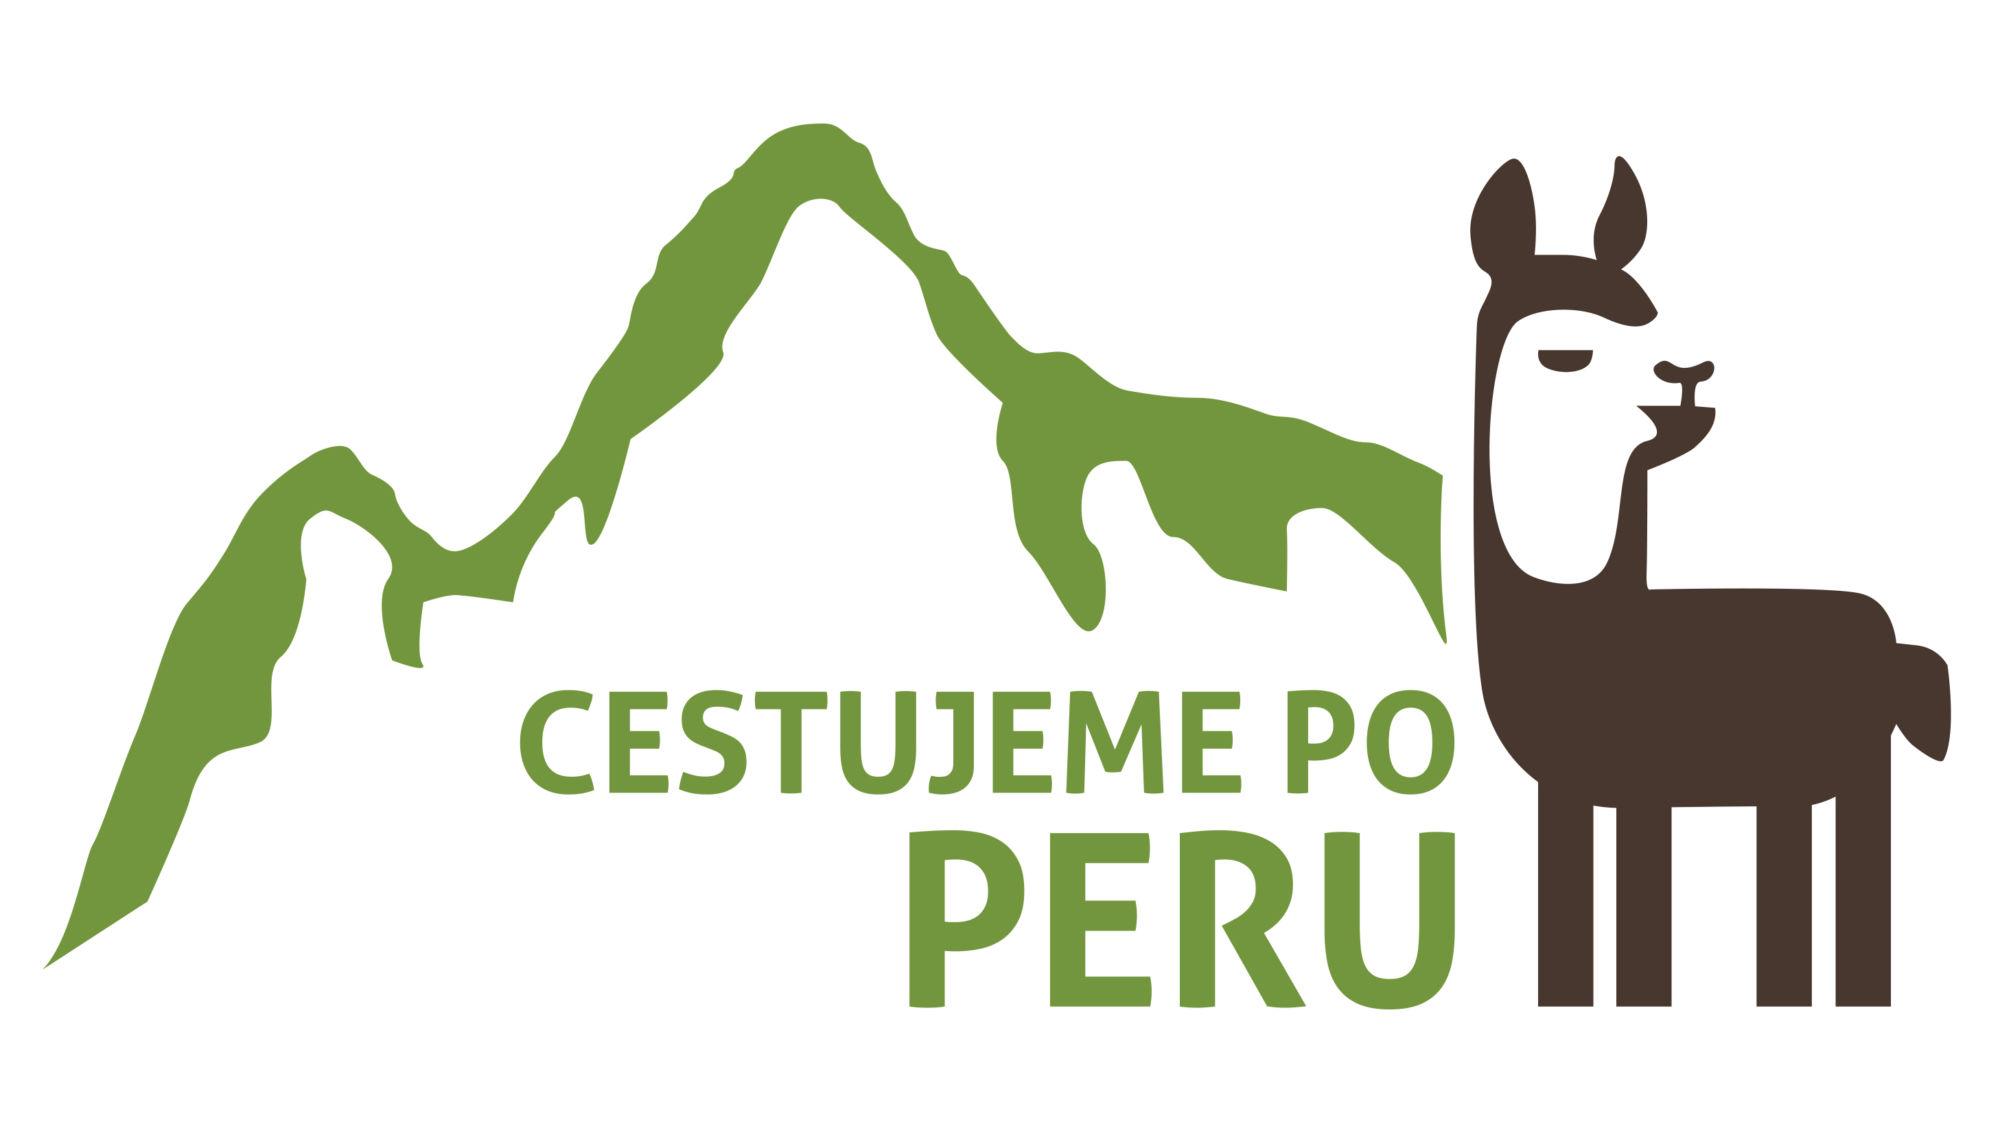 Cestujeme po Peru